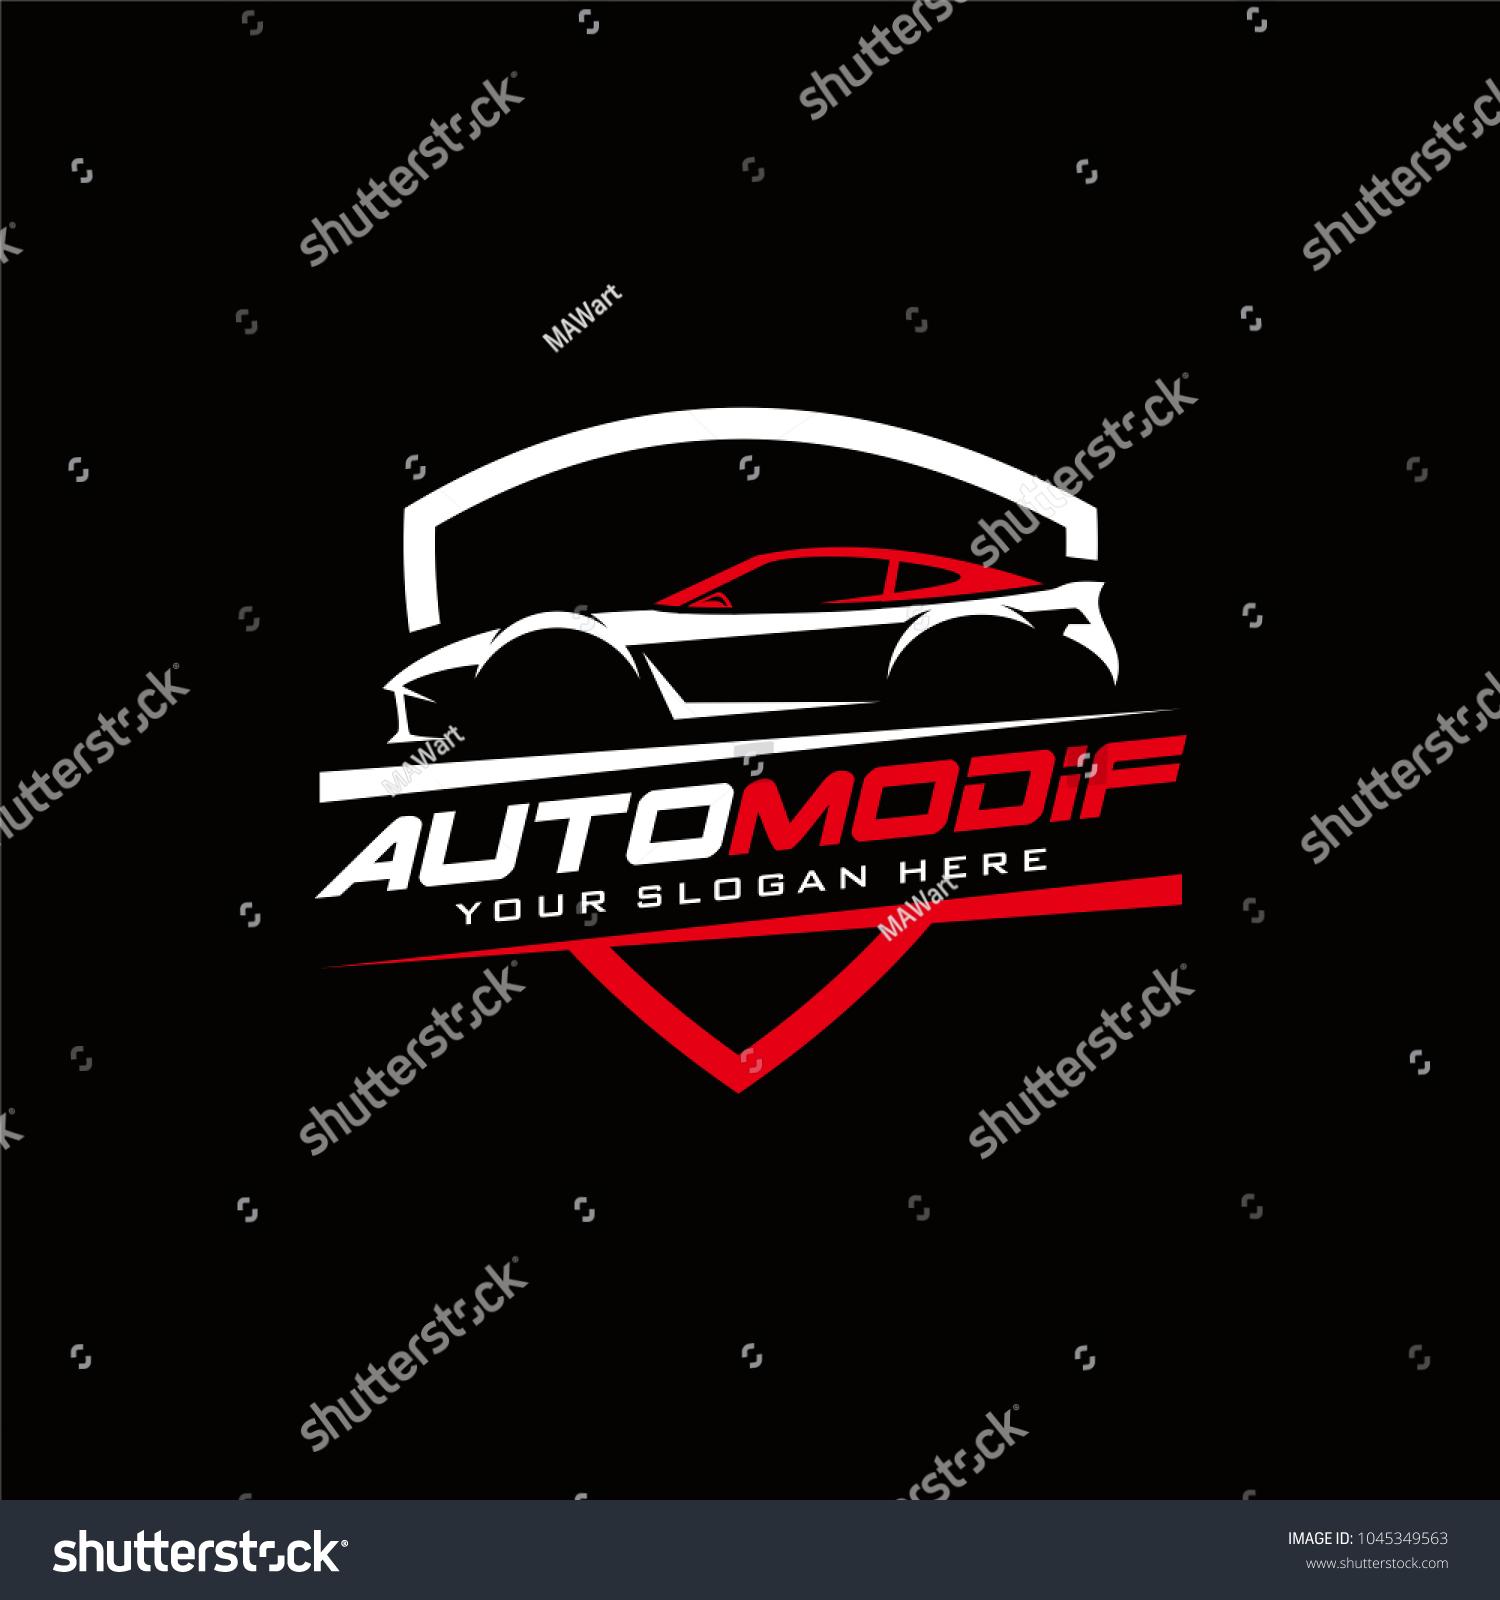 Pin by Sahan Wiki on Monash MotorSport logo inspiration